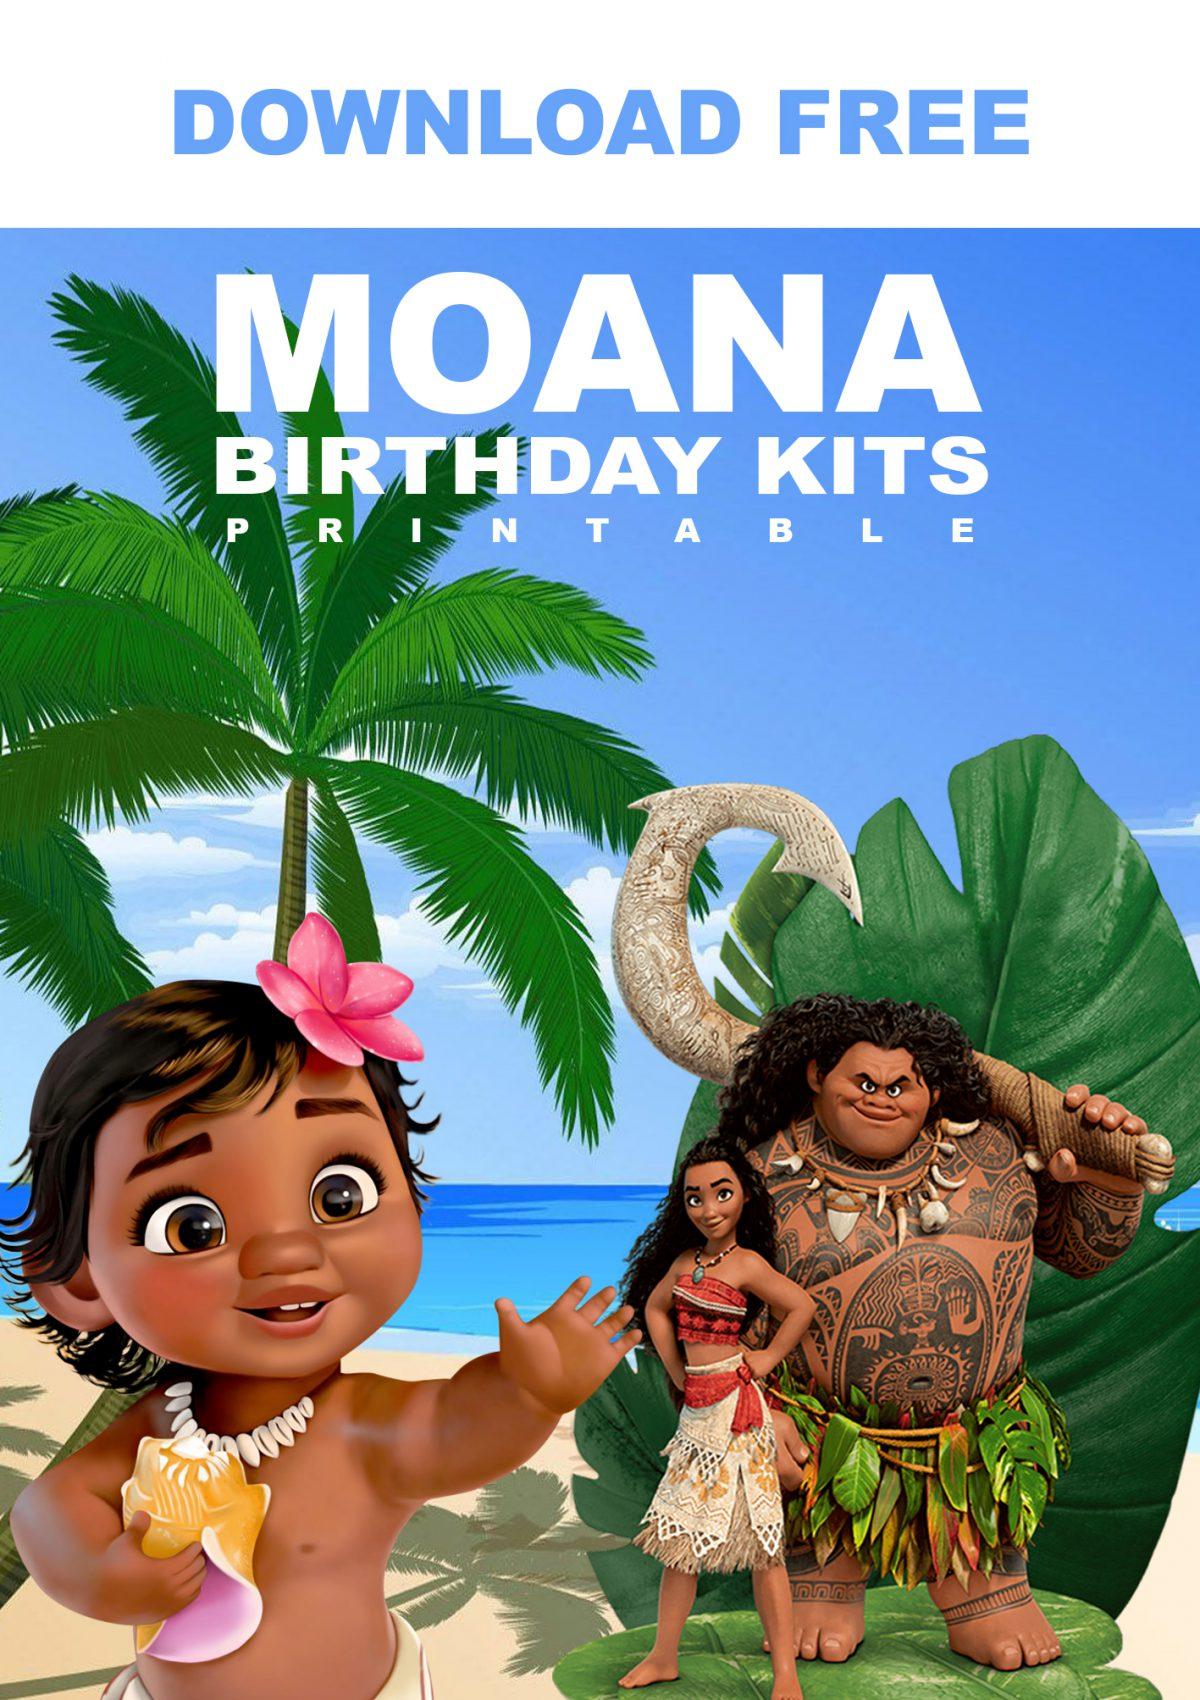 Free Printable Baby Moana Birthday Invitation Templates With Beach Background